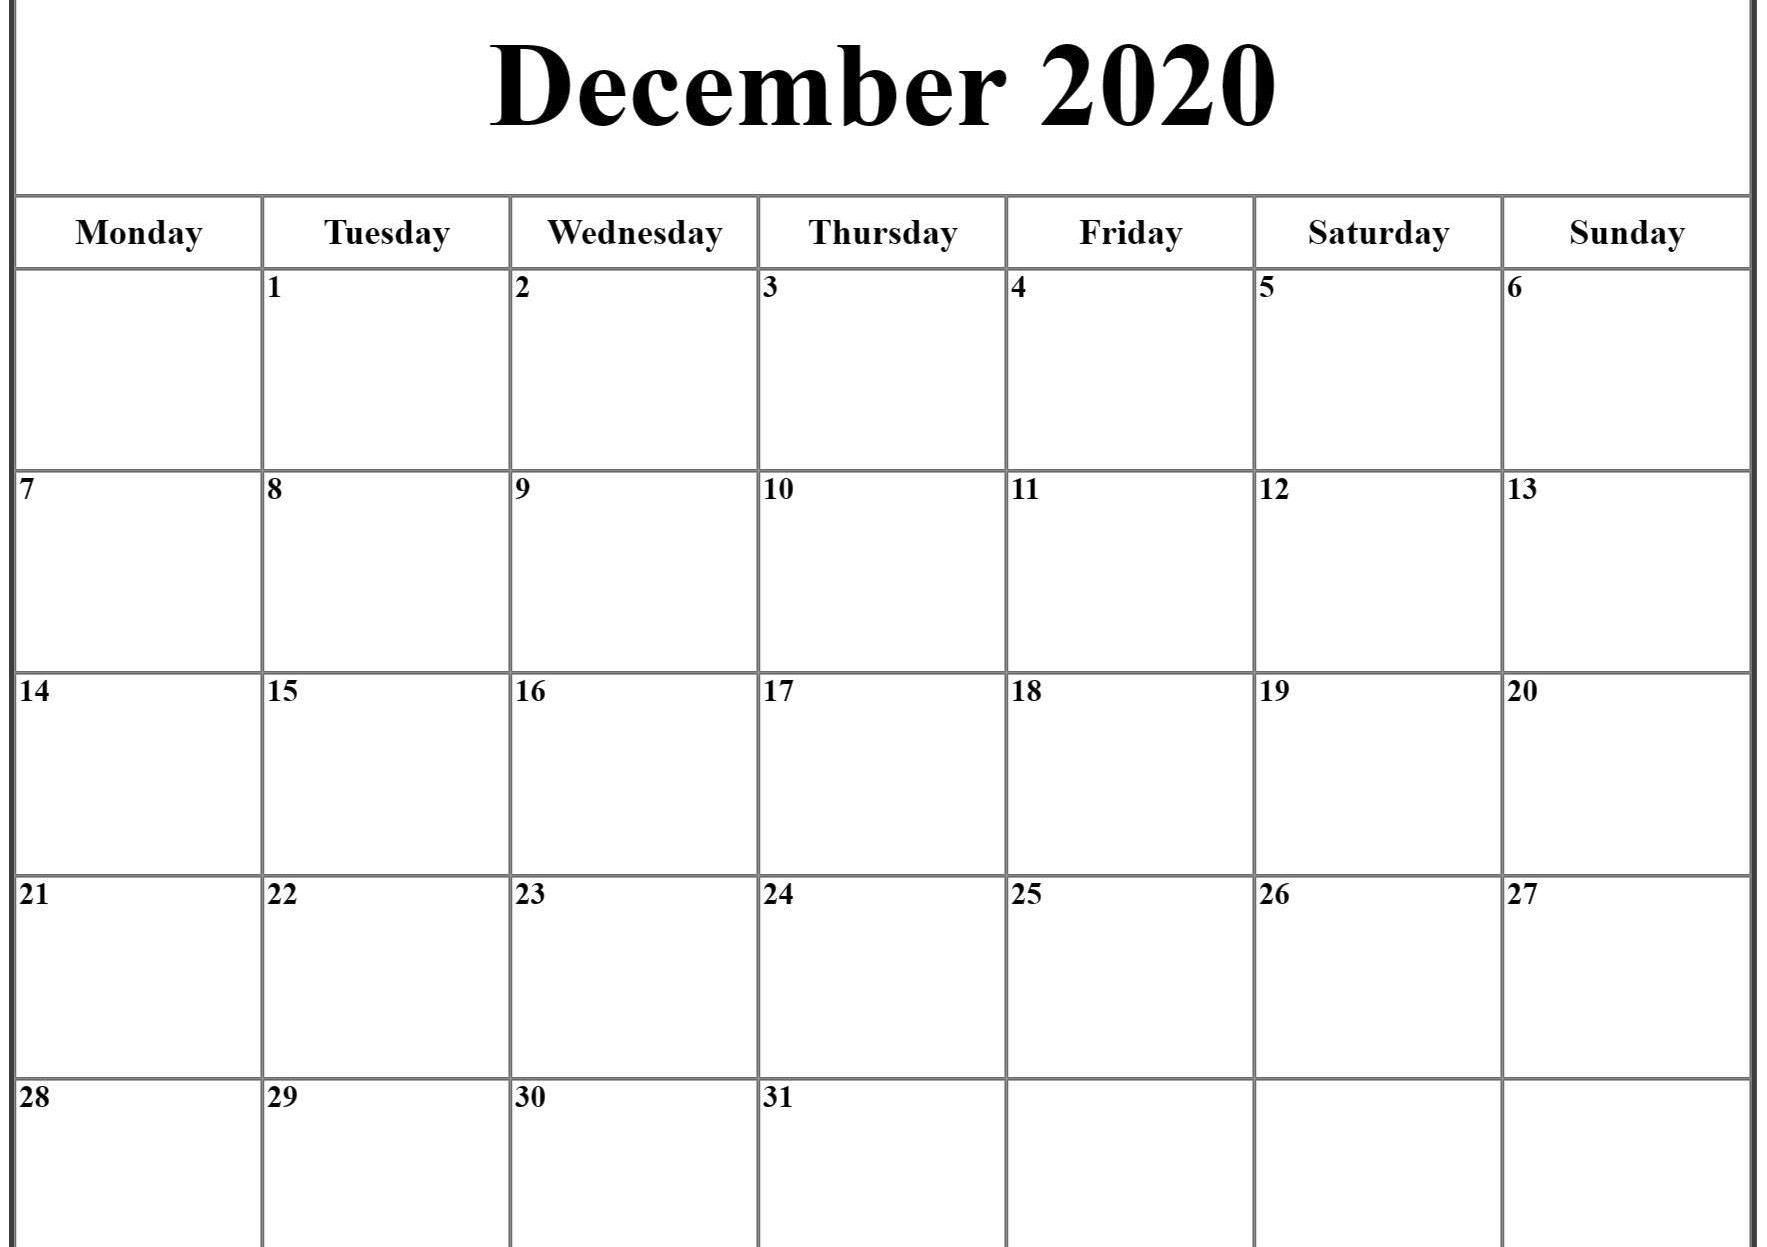 December 2020 Calendar Excel | Excel Calendar, December